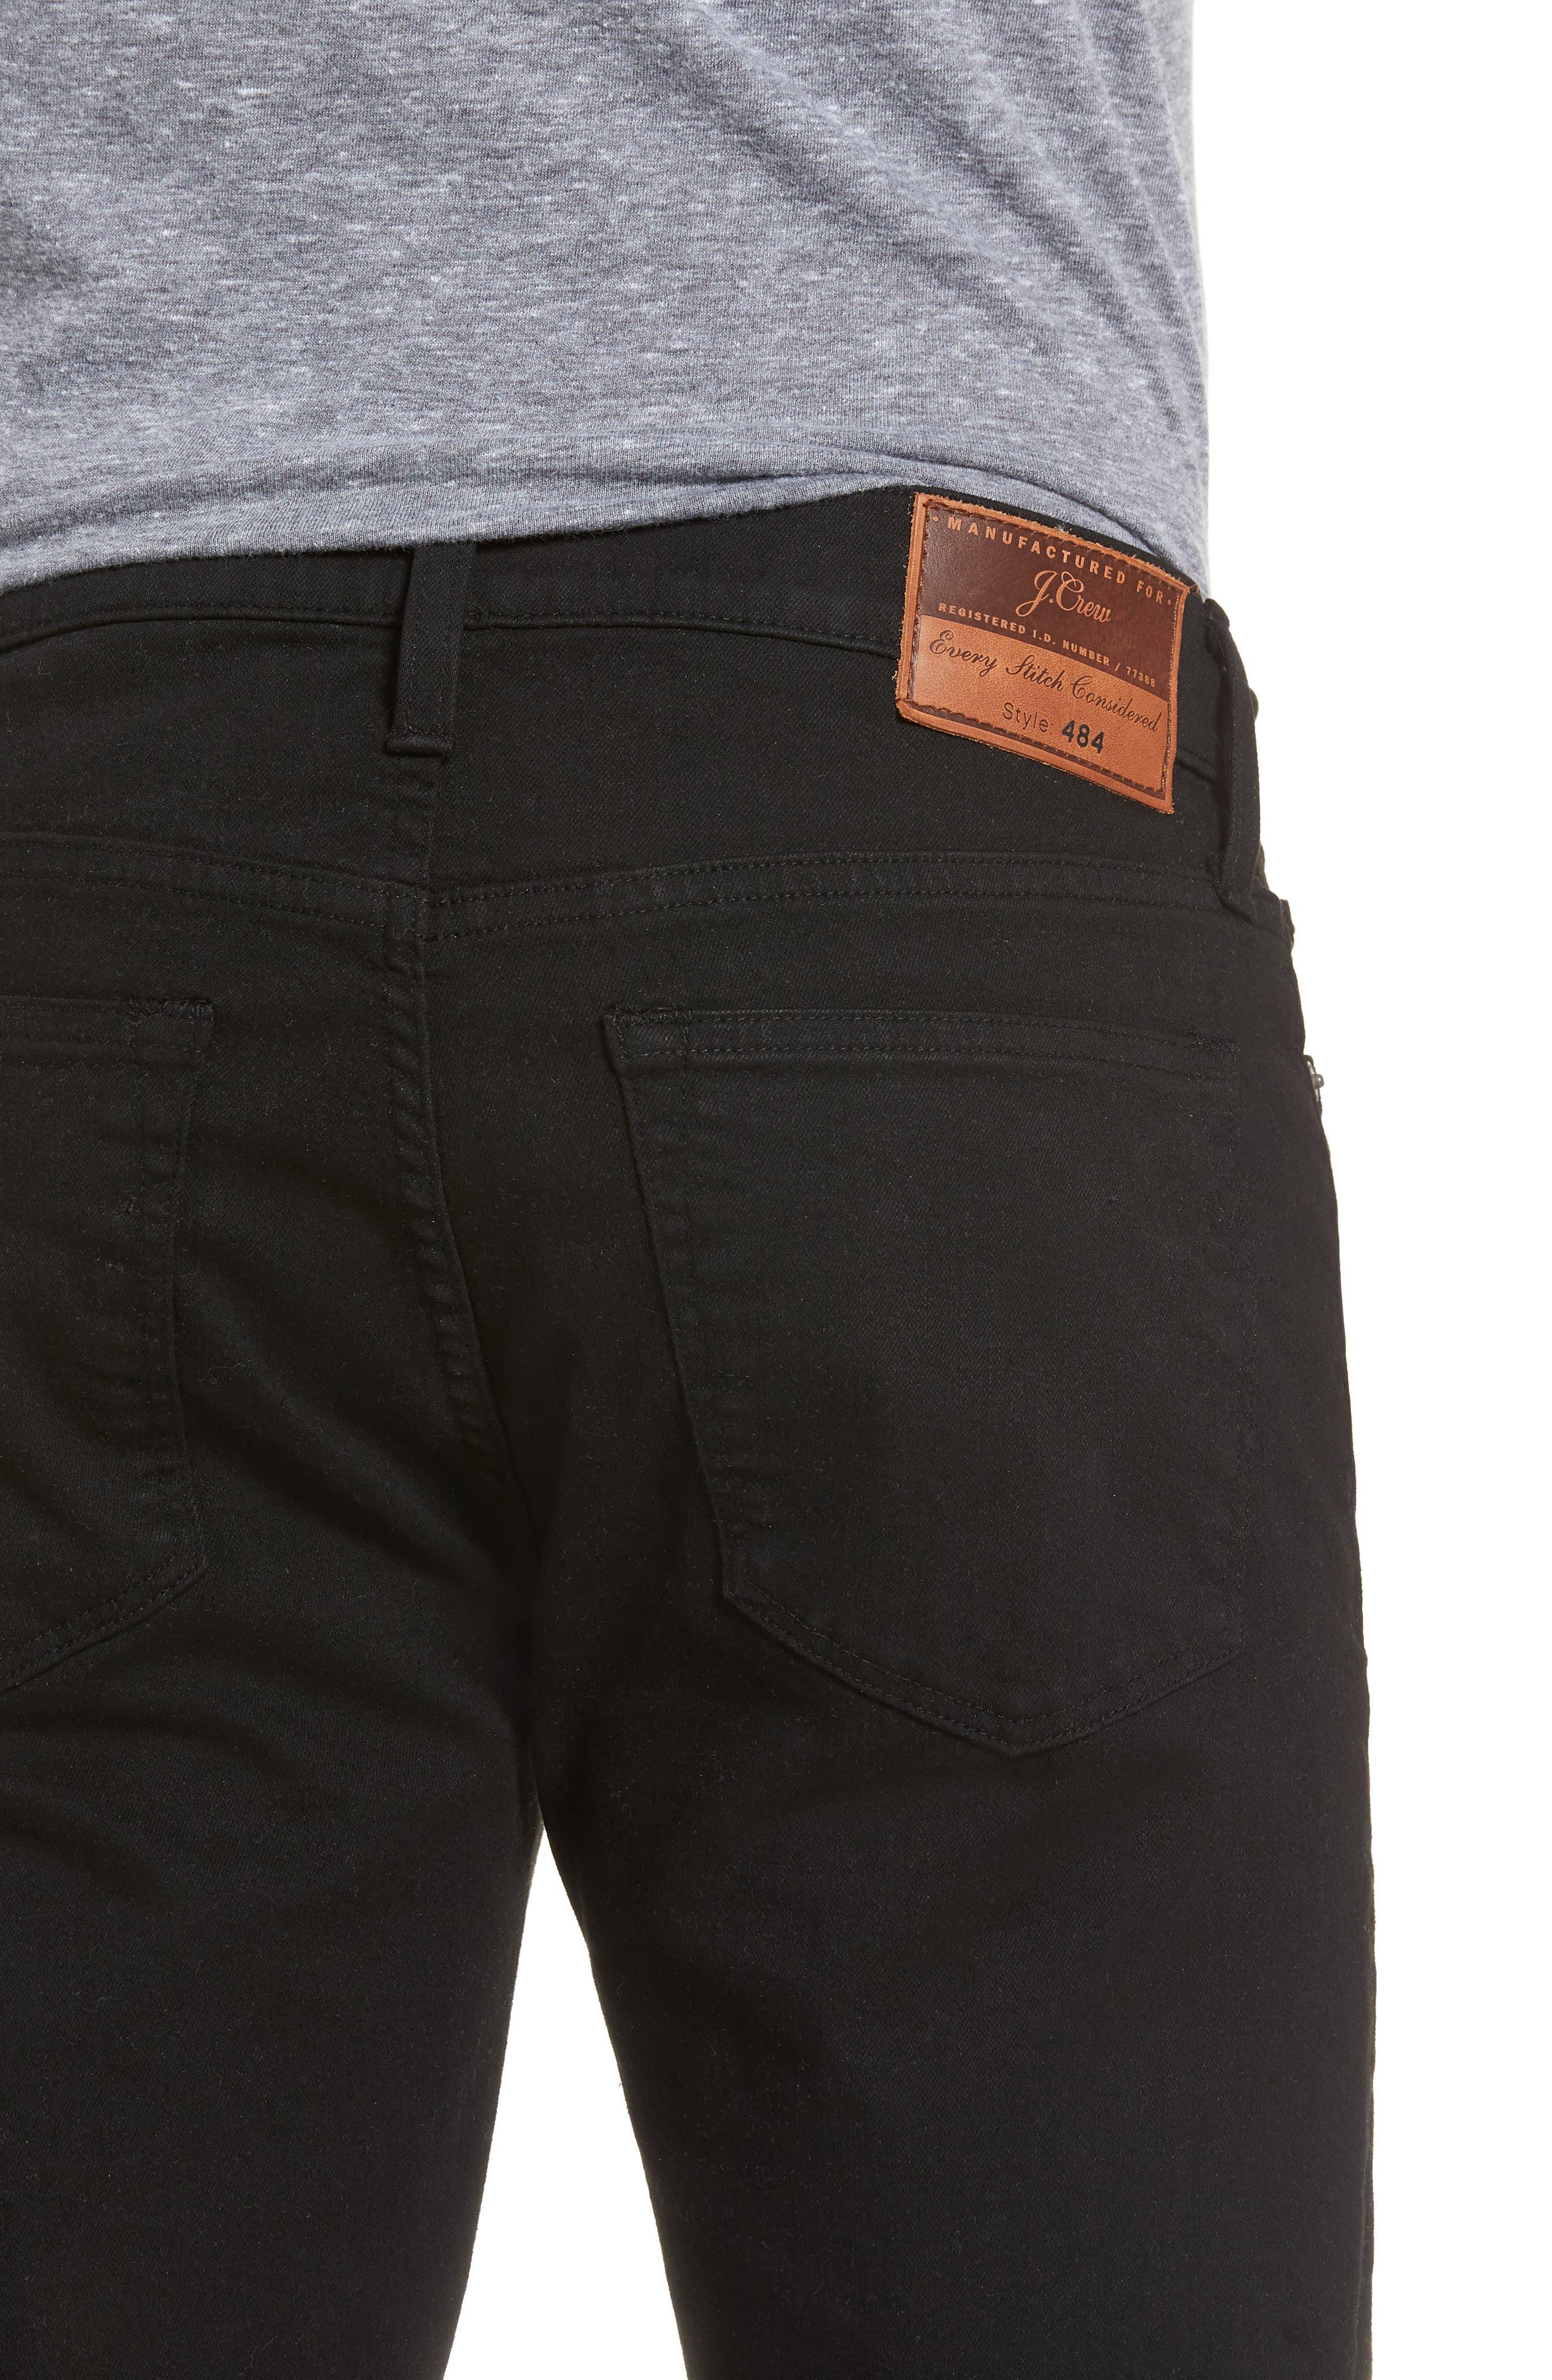 484 Slim Fit Stretch Jeans,                             Alternate thumbnail 4, color,                             009